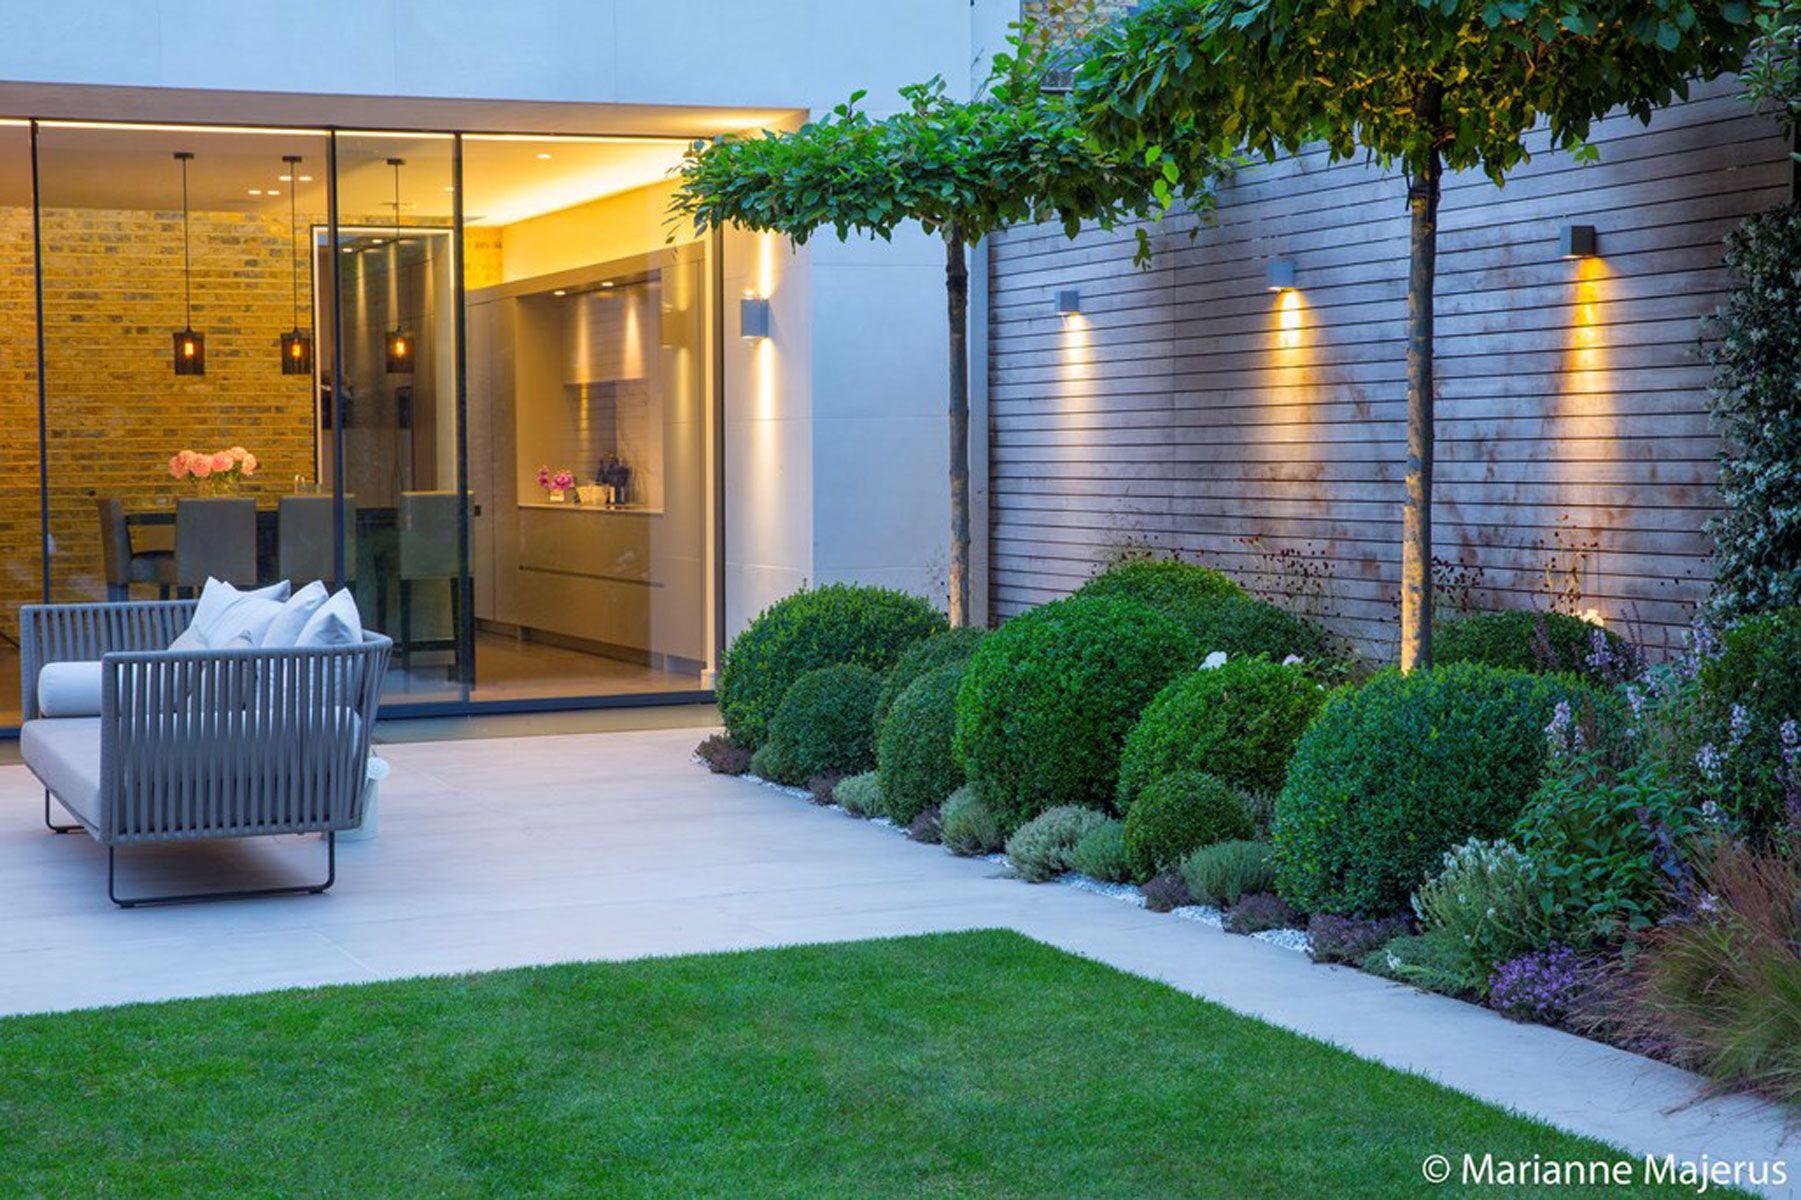 Wandsworth - Garden Design & Landscaping Project | Modern ...